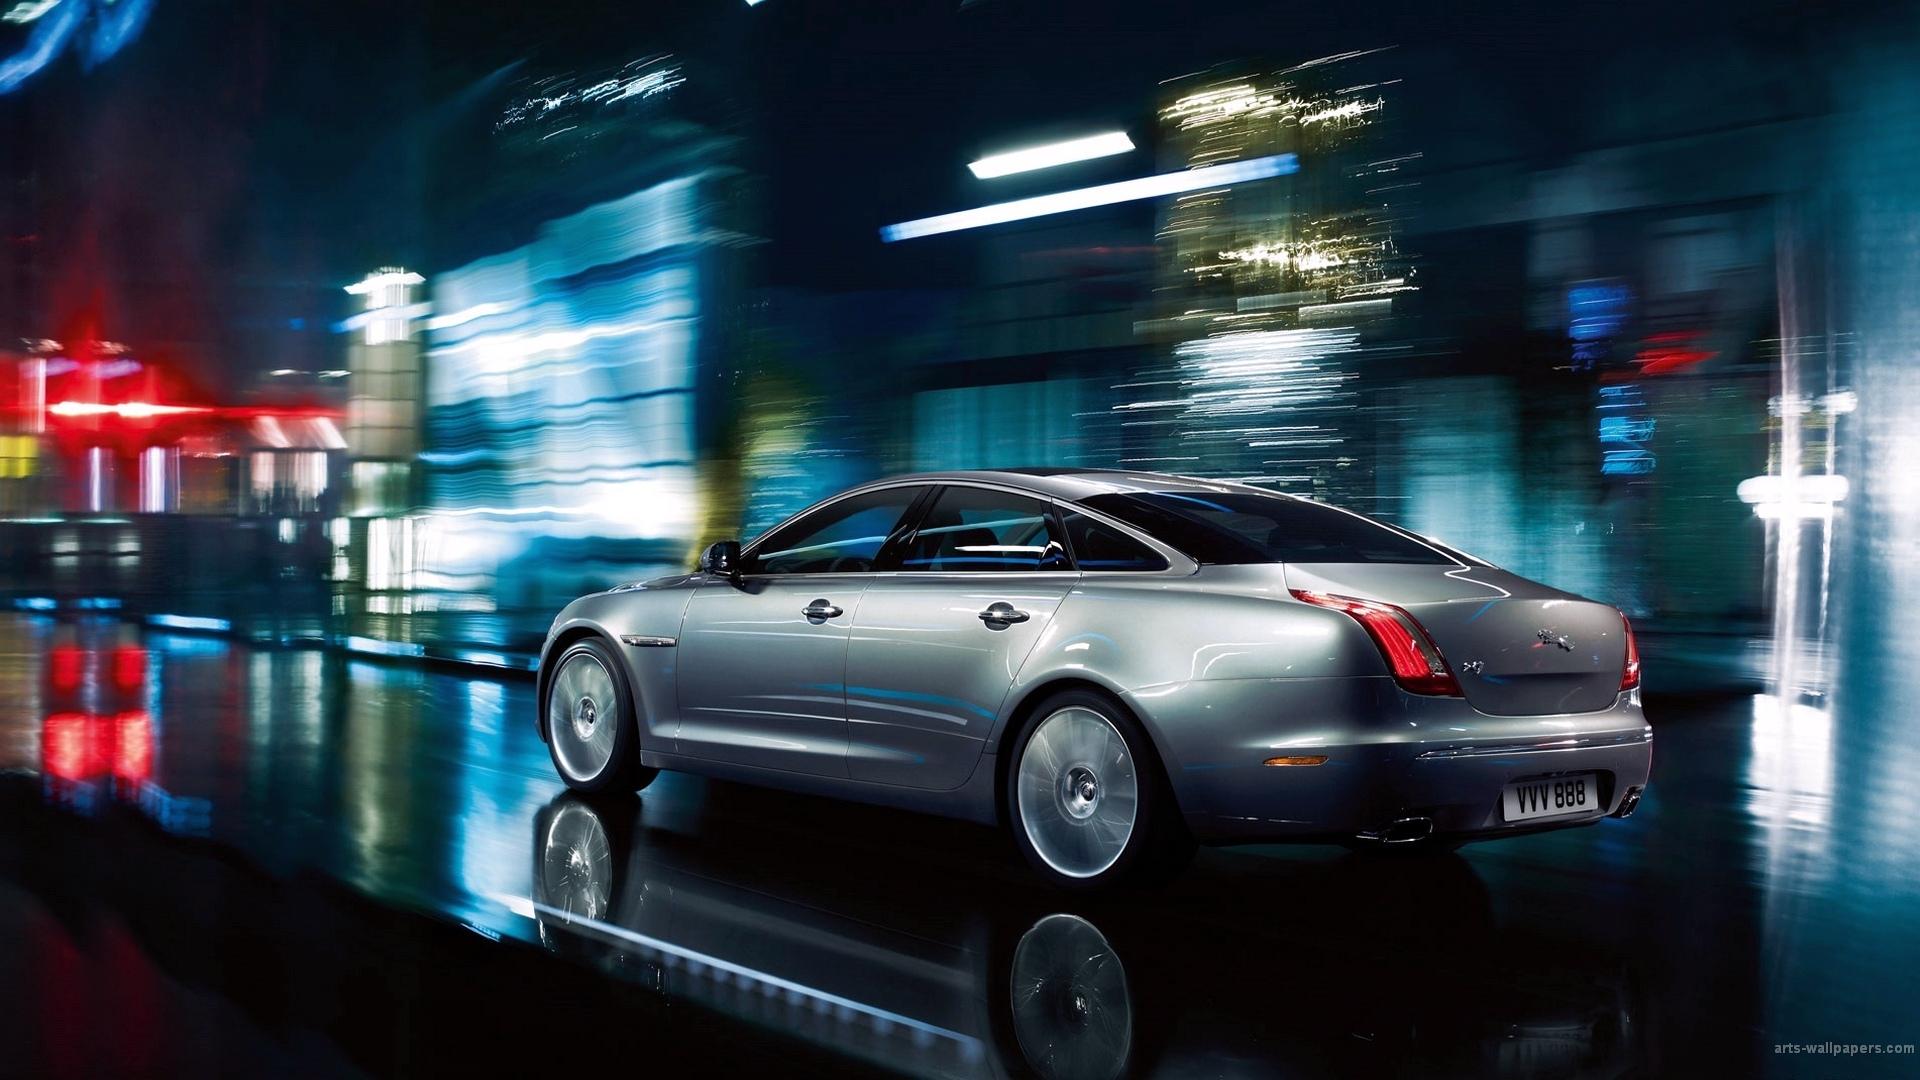 Full HD Wallpapers 1080p Wallpaper Backgrounds Jaguar Cars Full HD 1920x1080